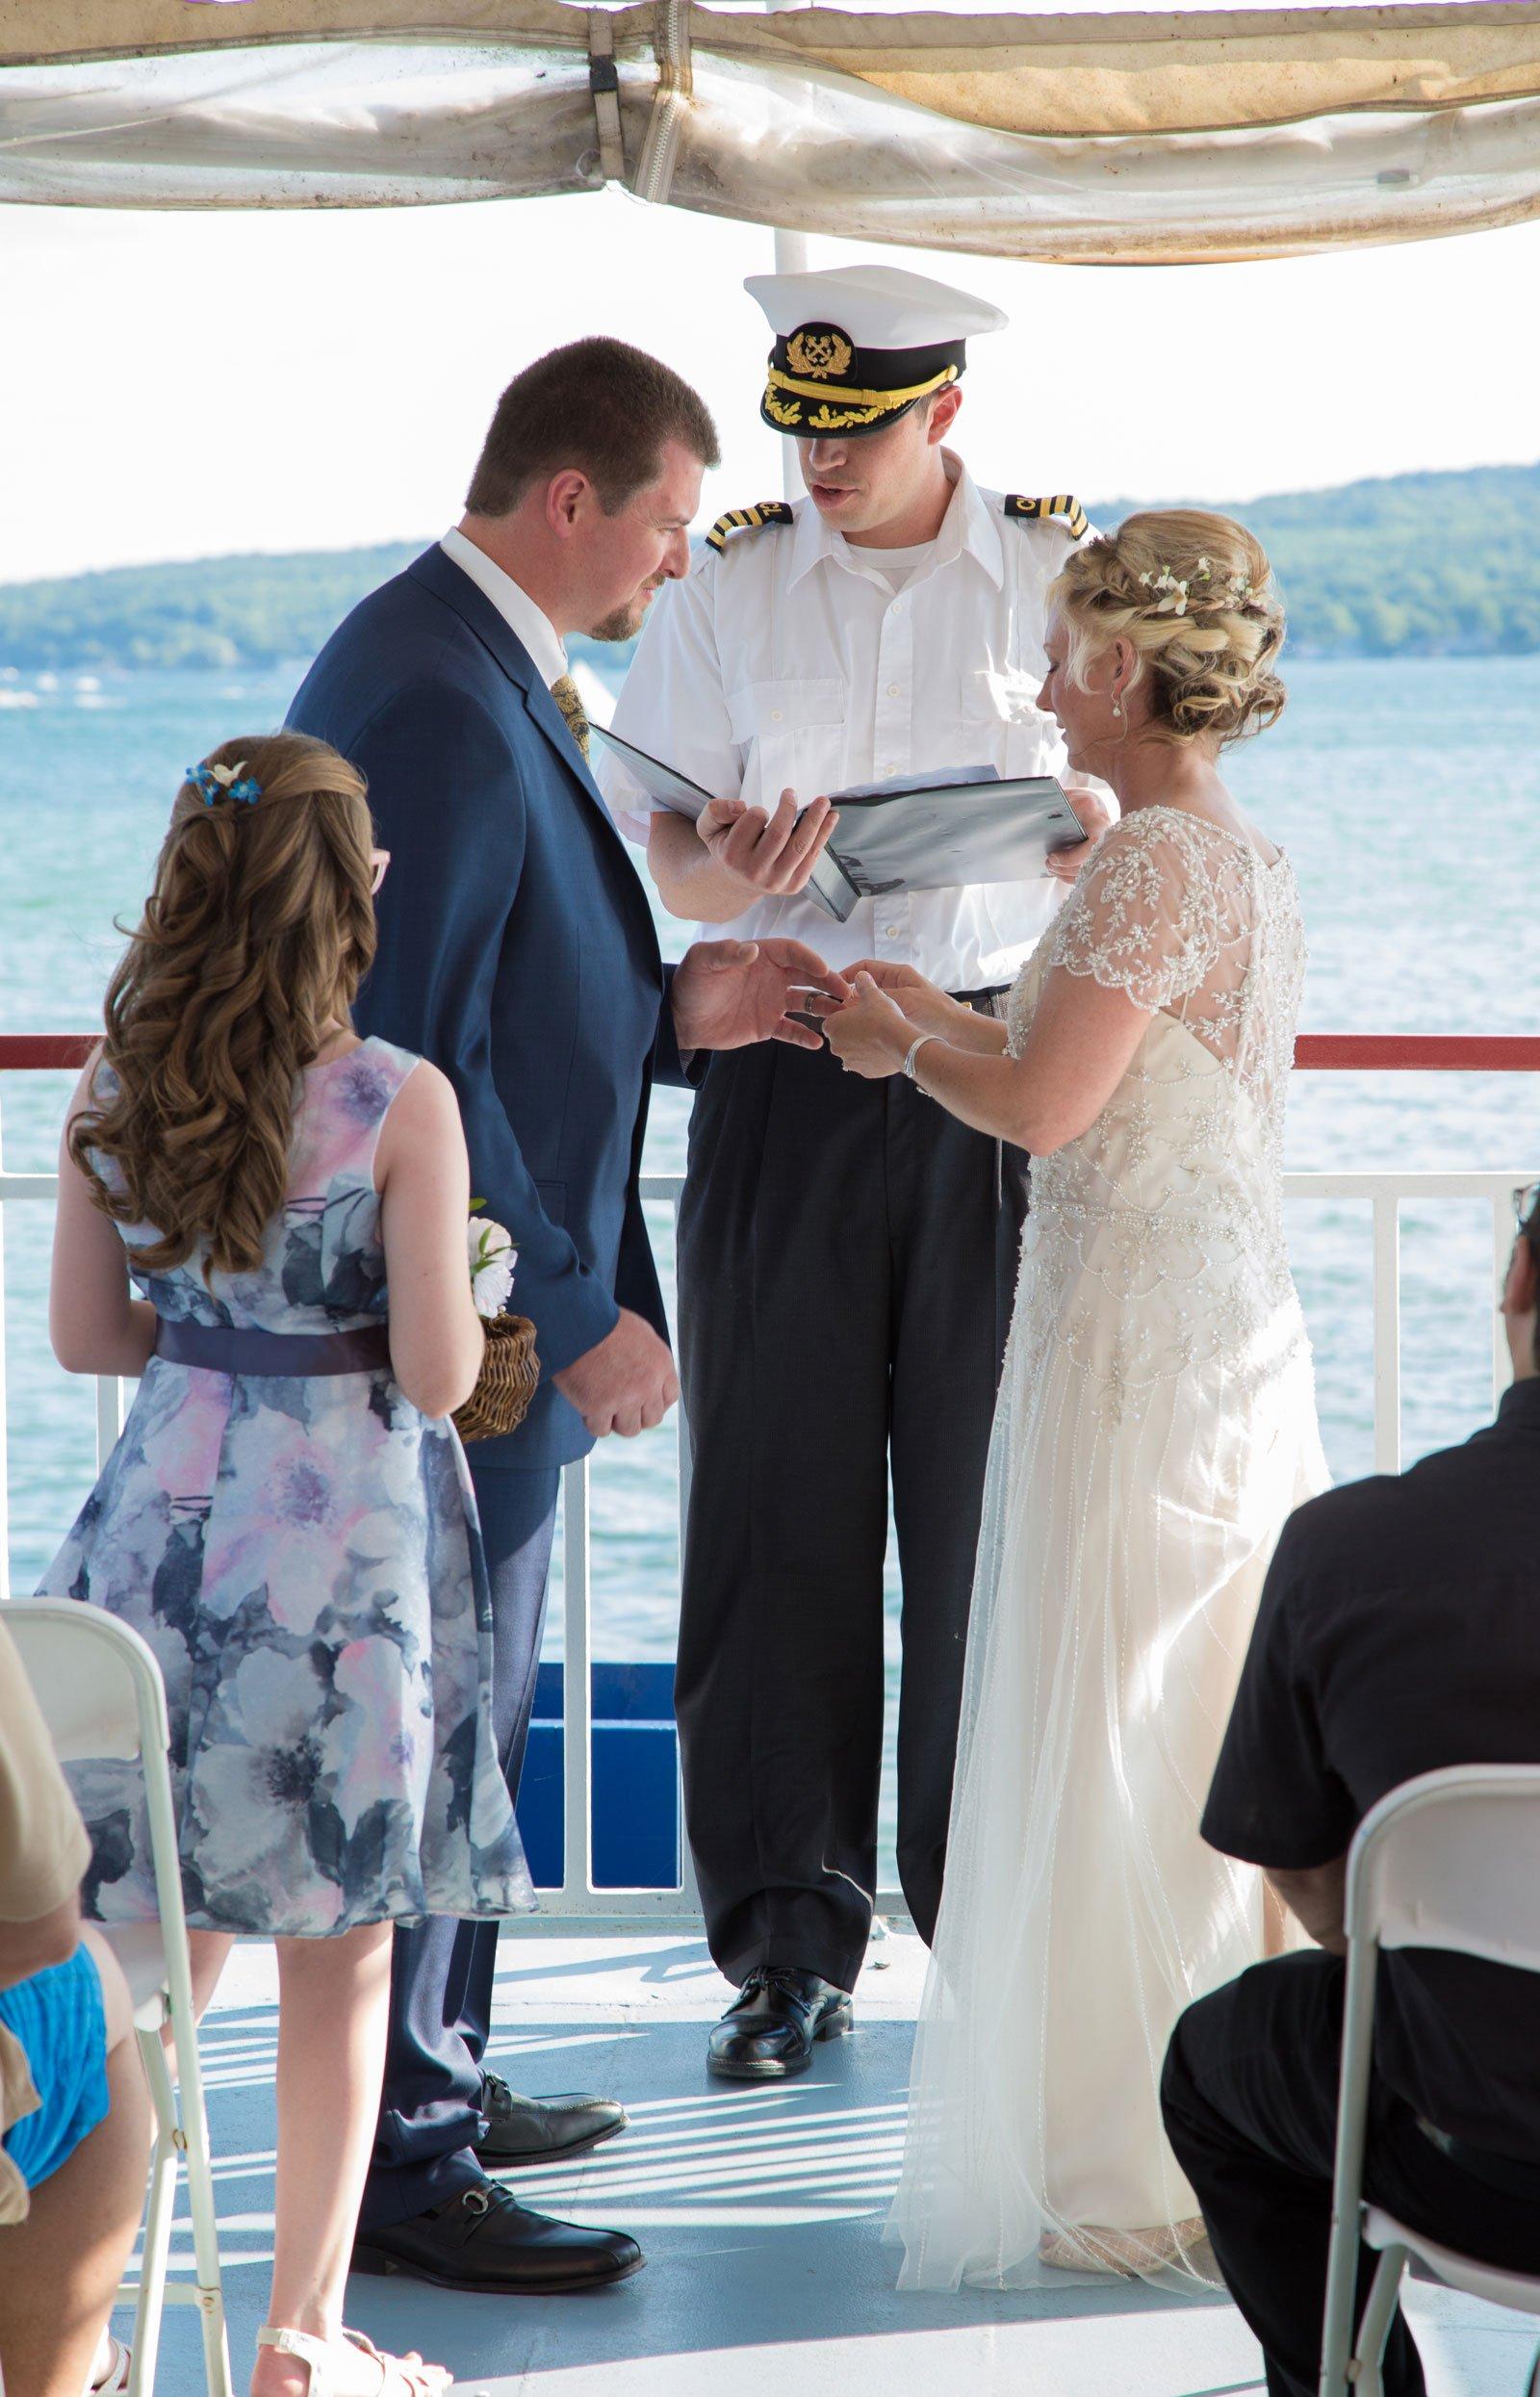 Canandaigua NY Wedding Ceremony wedding vows